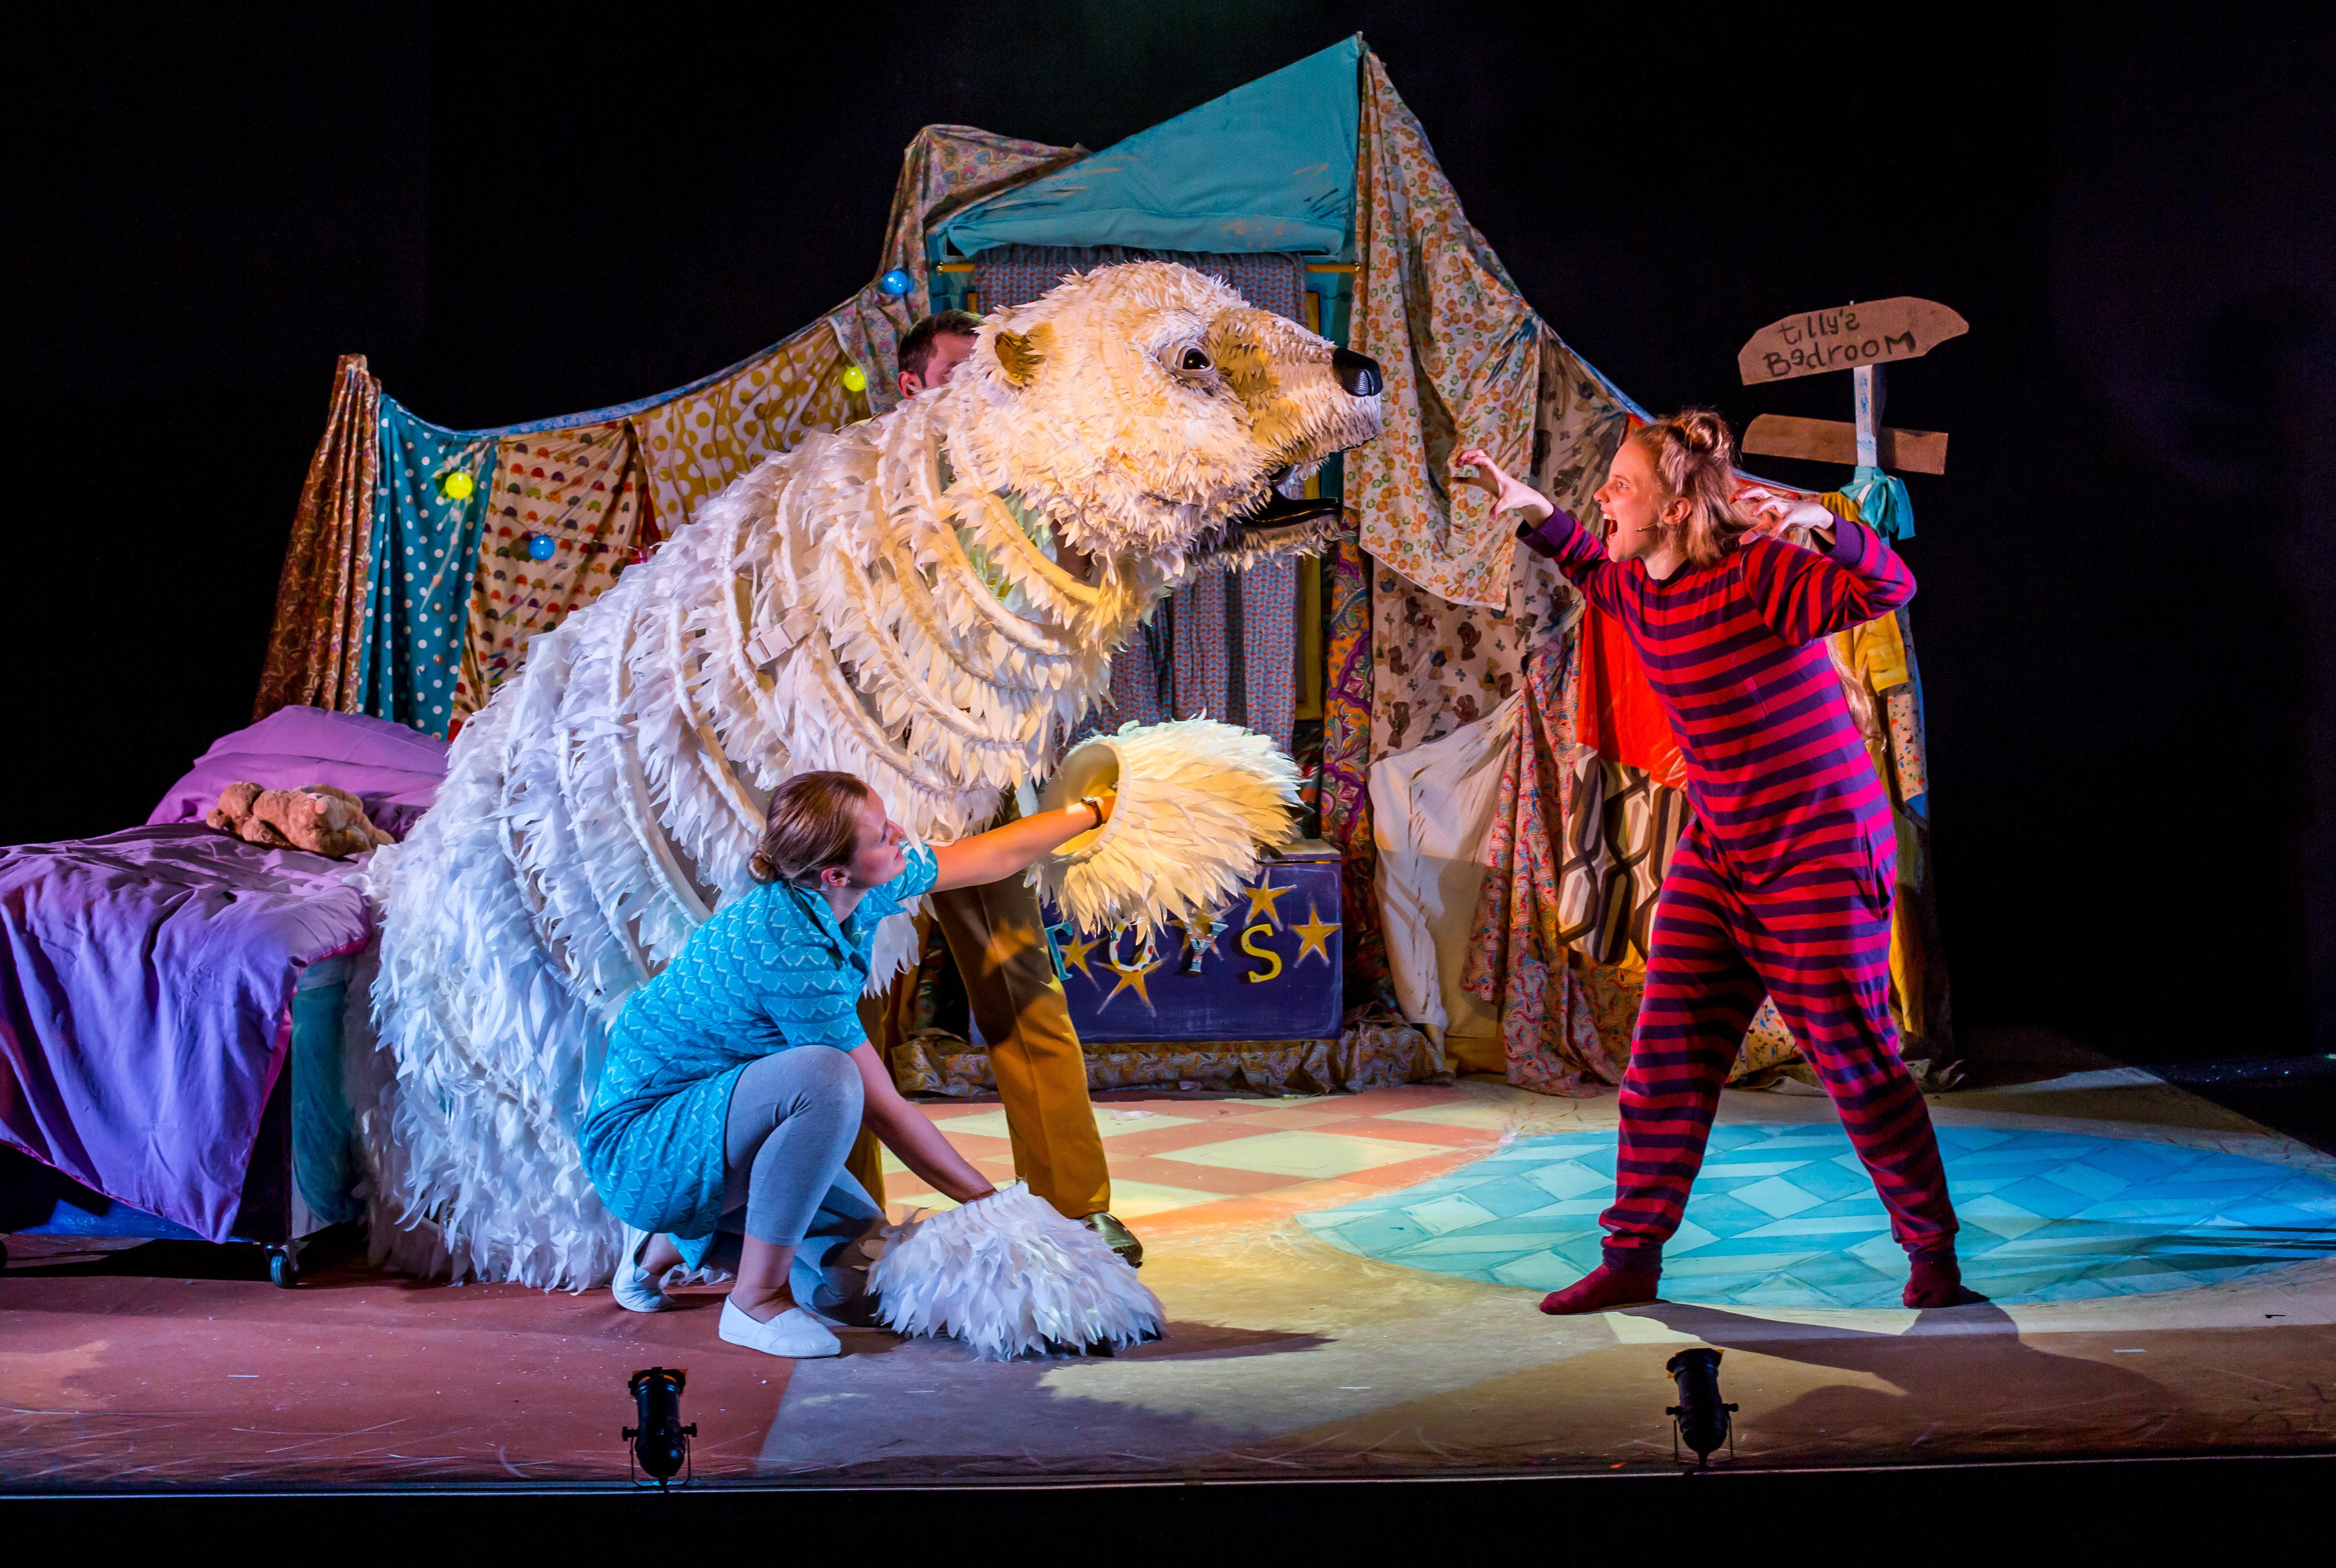 Raymond Brigg's The Bear